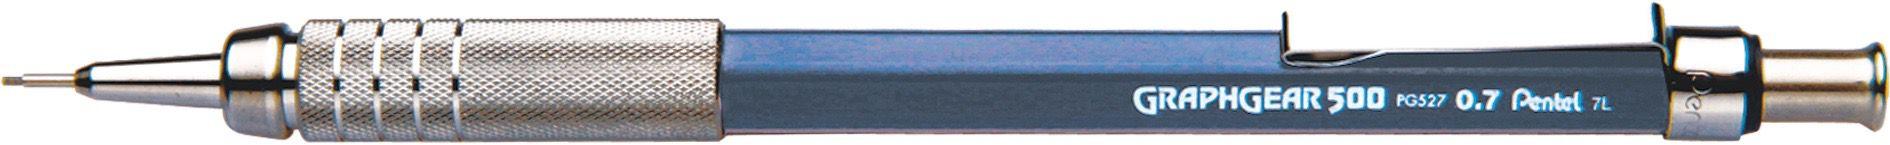 Lapiseira 0.7mm Pentel Graphgear - Azul